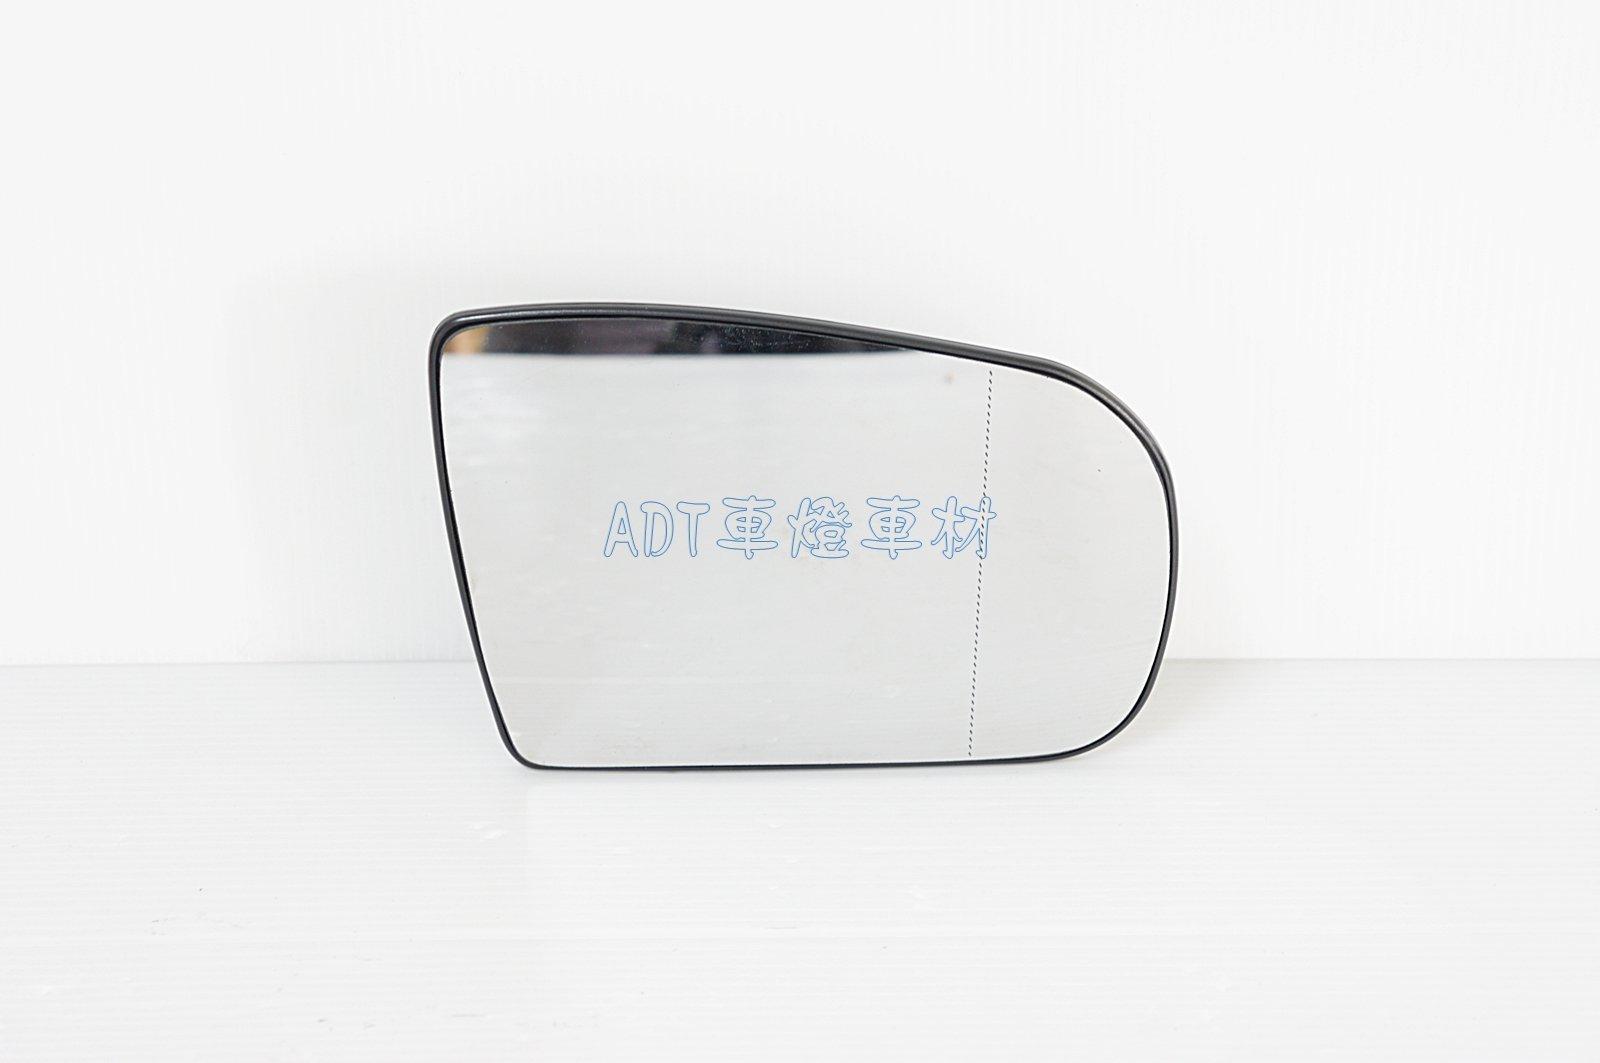 ~~ADT.車燈.車材~~BENZ W210 99 00 01 02  後期專用 後視鏡 鏡片含底座